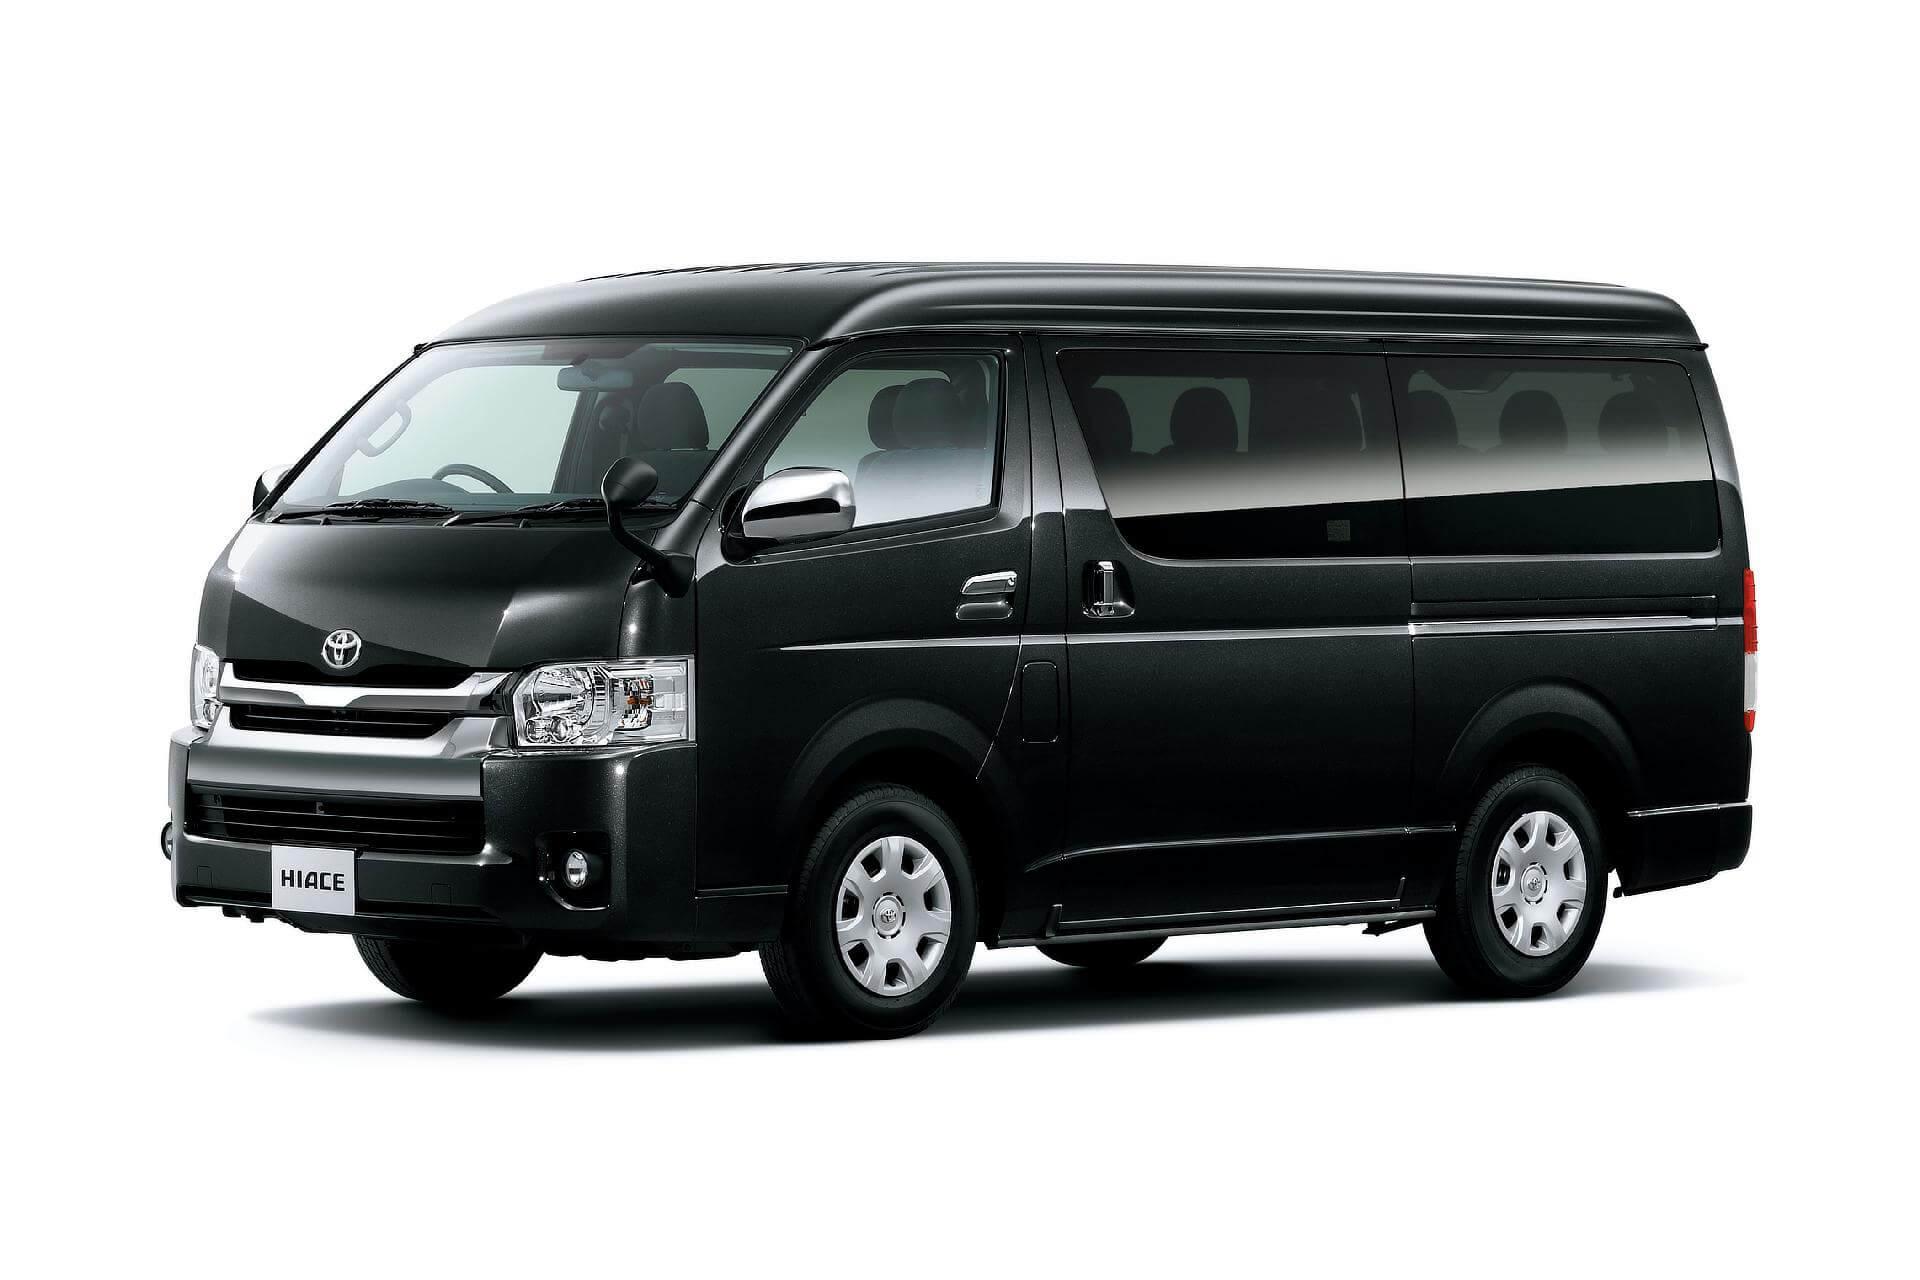 Toyota_Hiace_CBF-TRH211K-KRTEK_front_side